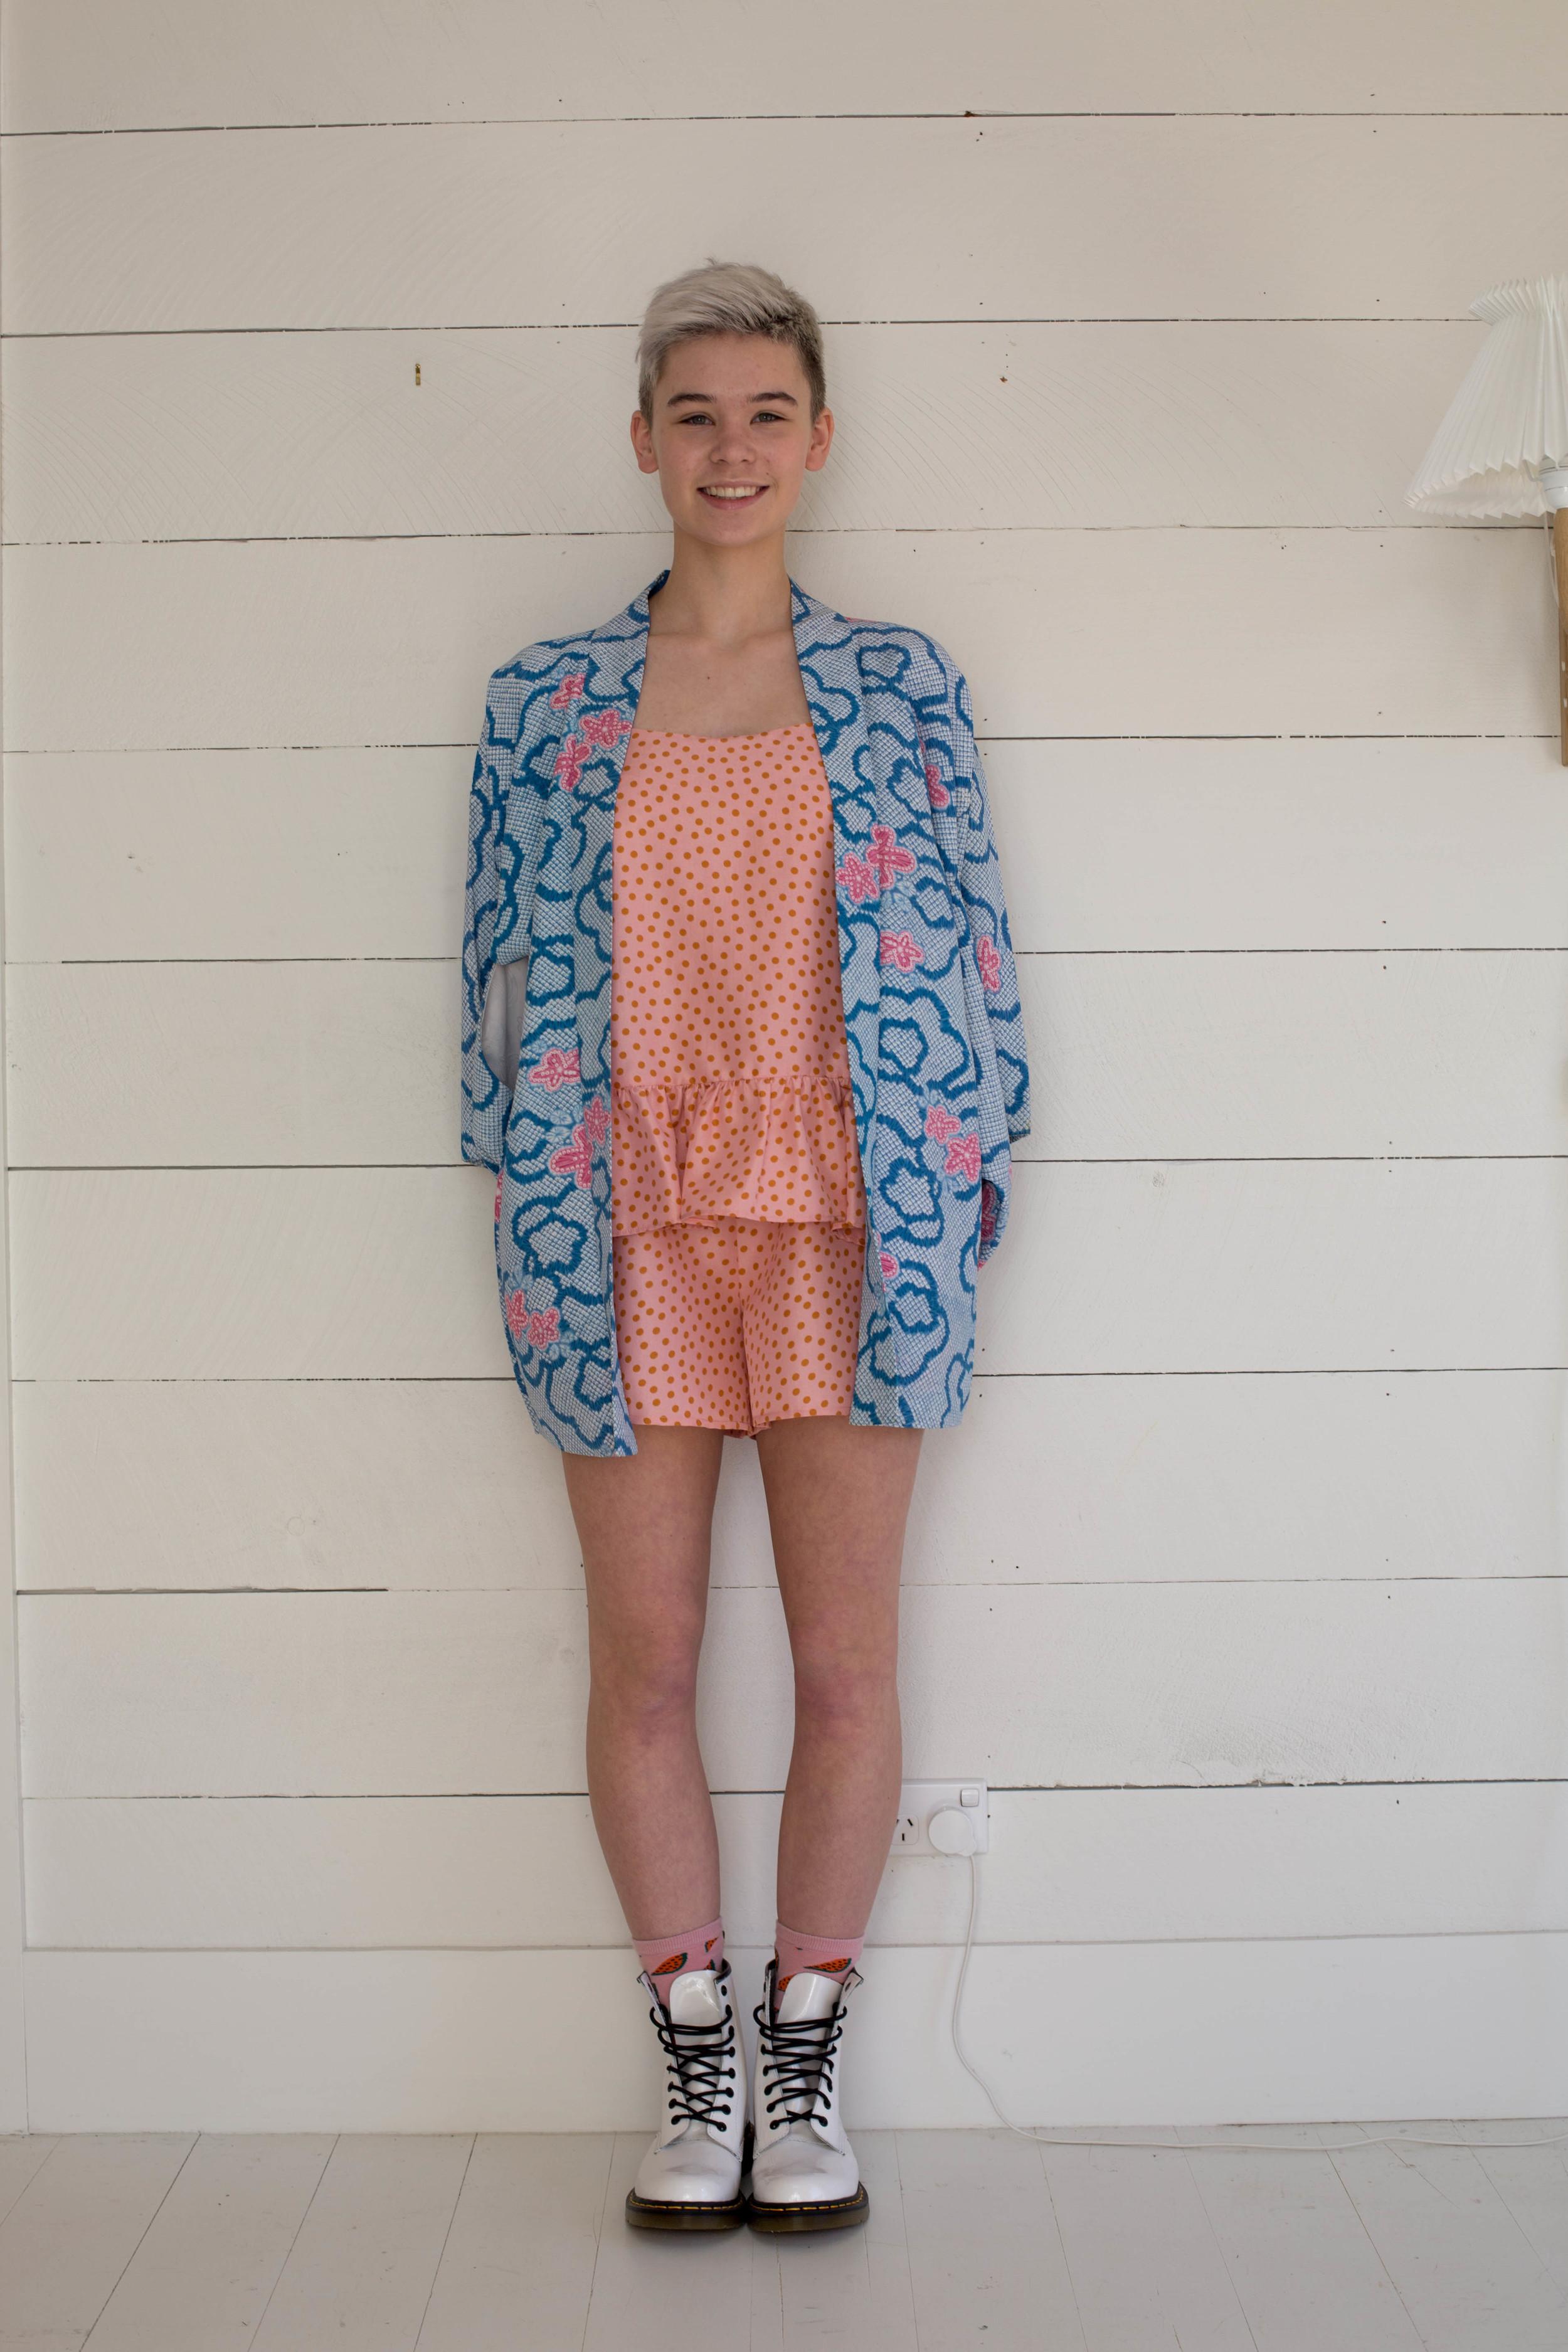 Ace Ruffle Playsuit with vintage child's Kimono